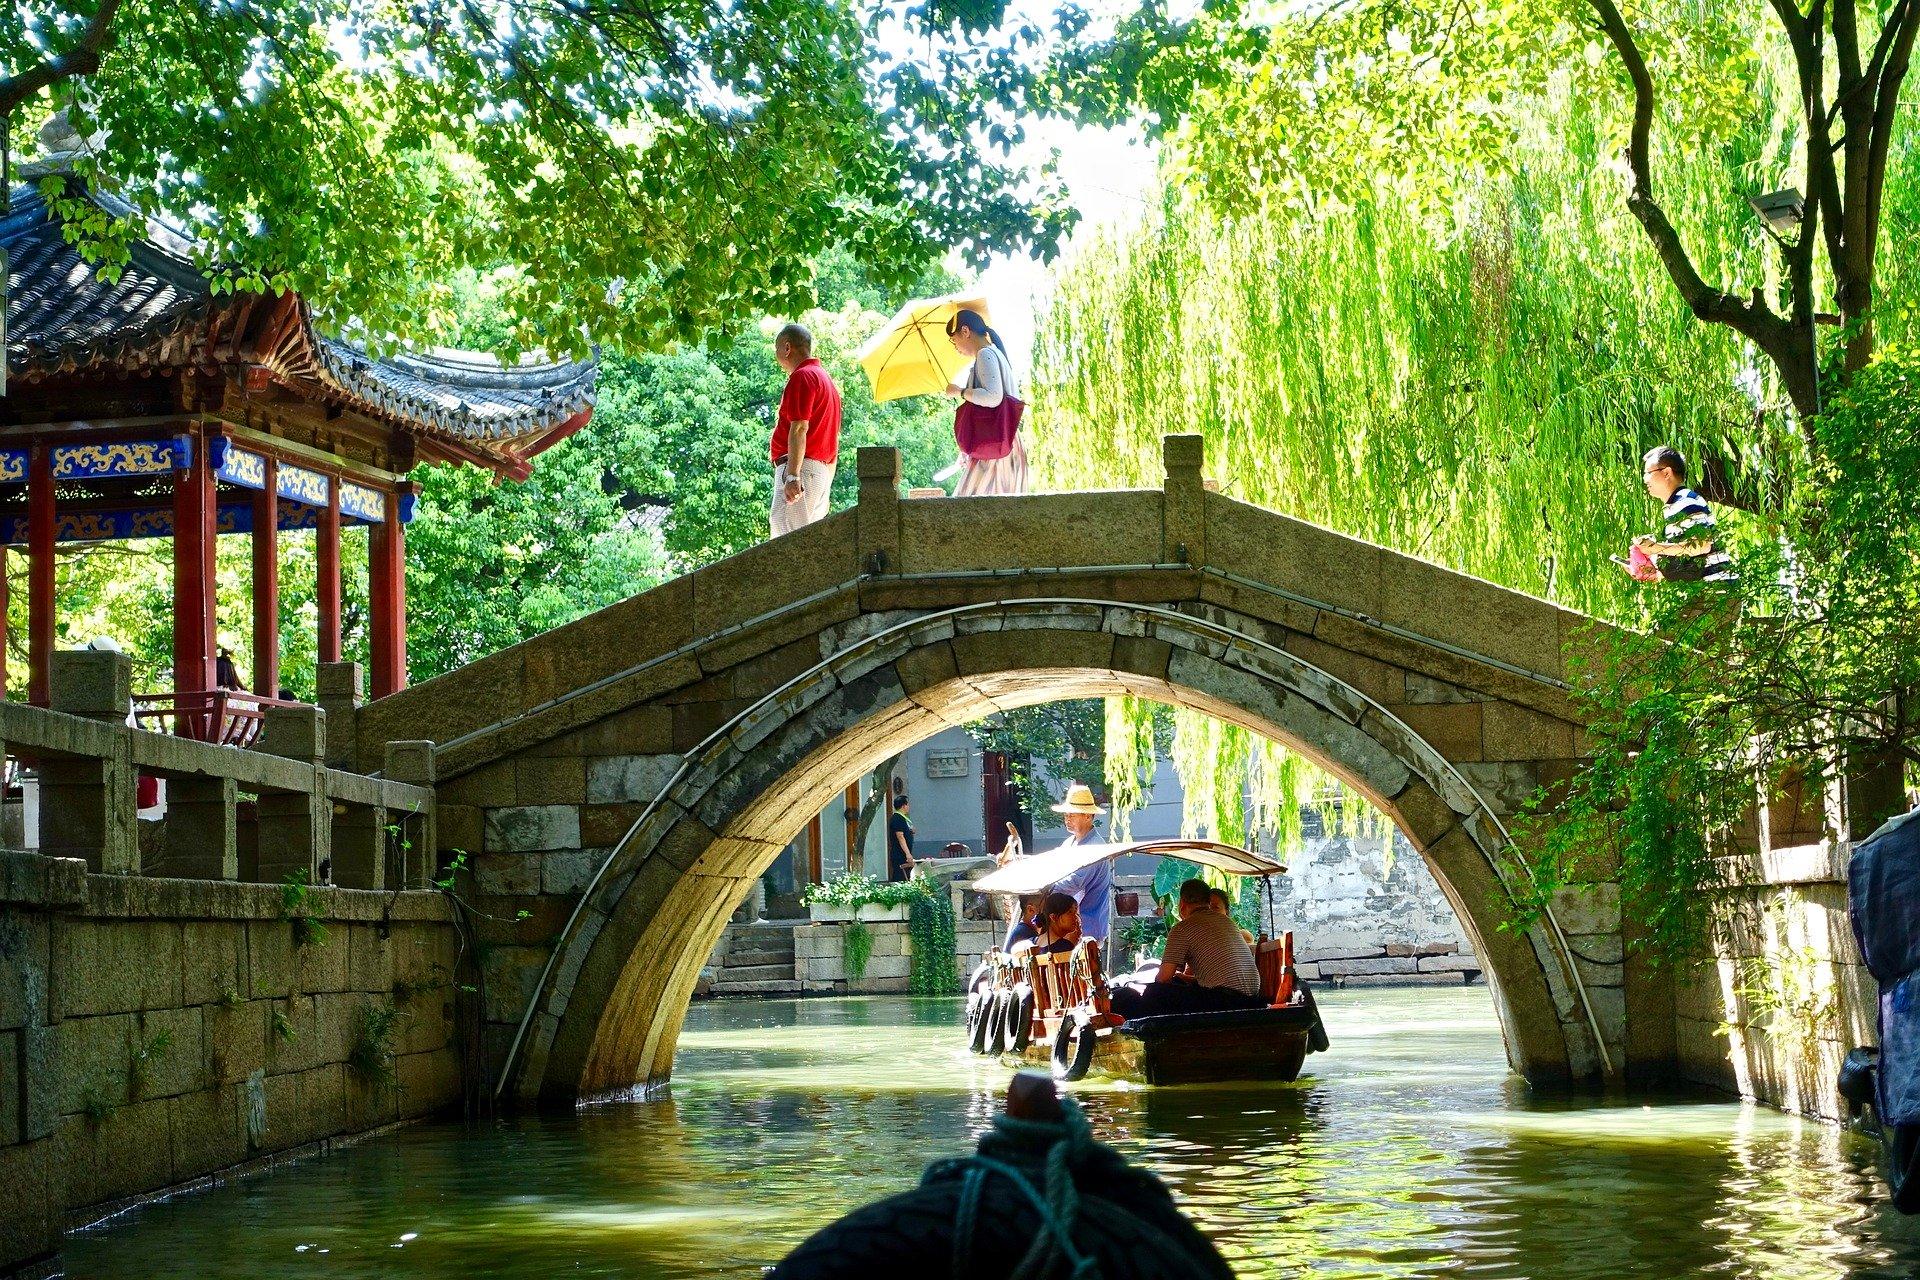 Suzhou, through the eyes of a Pixabay photographer